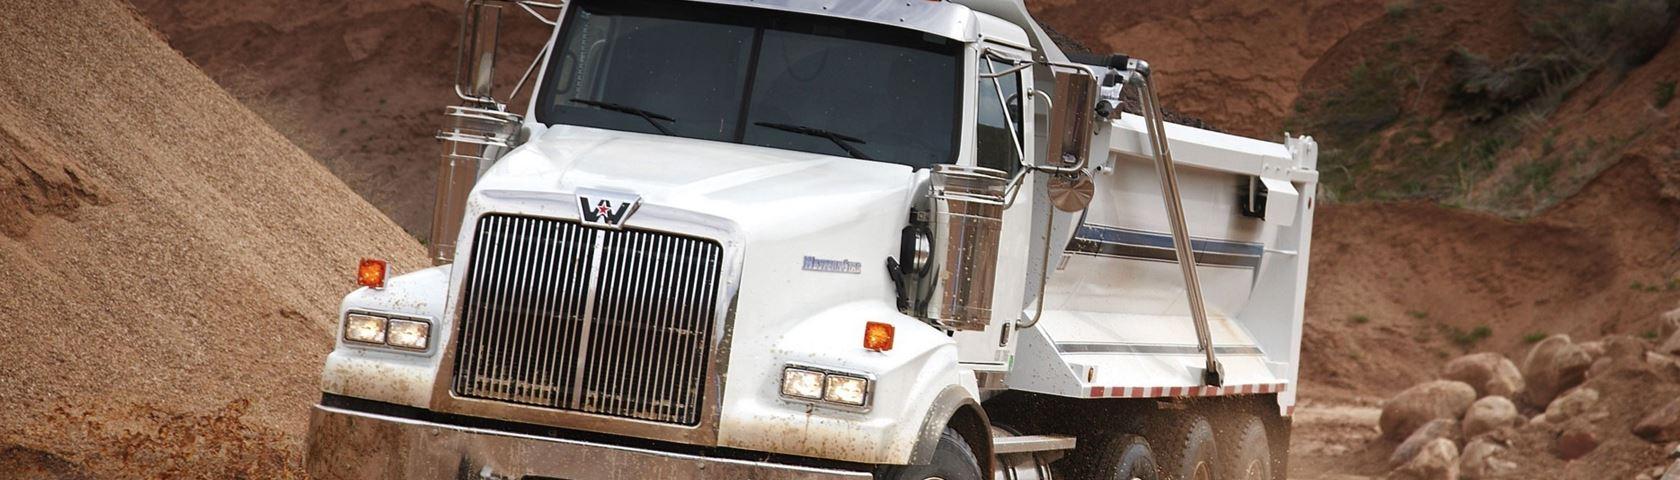 Superstar Truck in Action